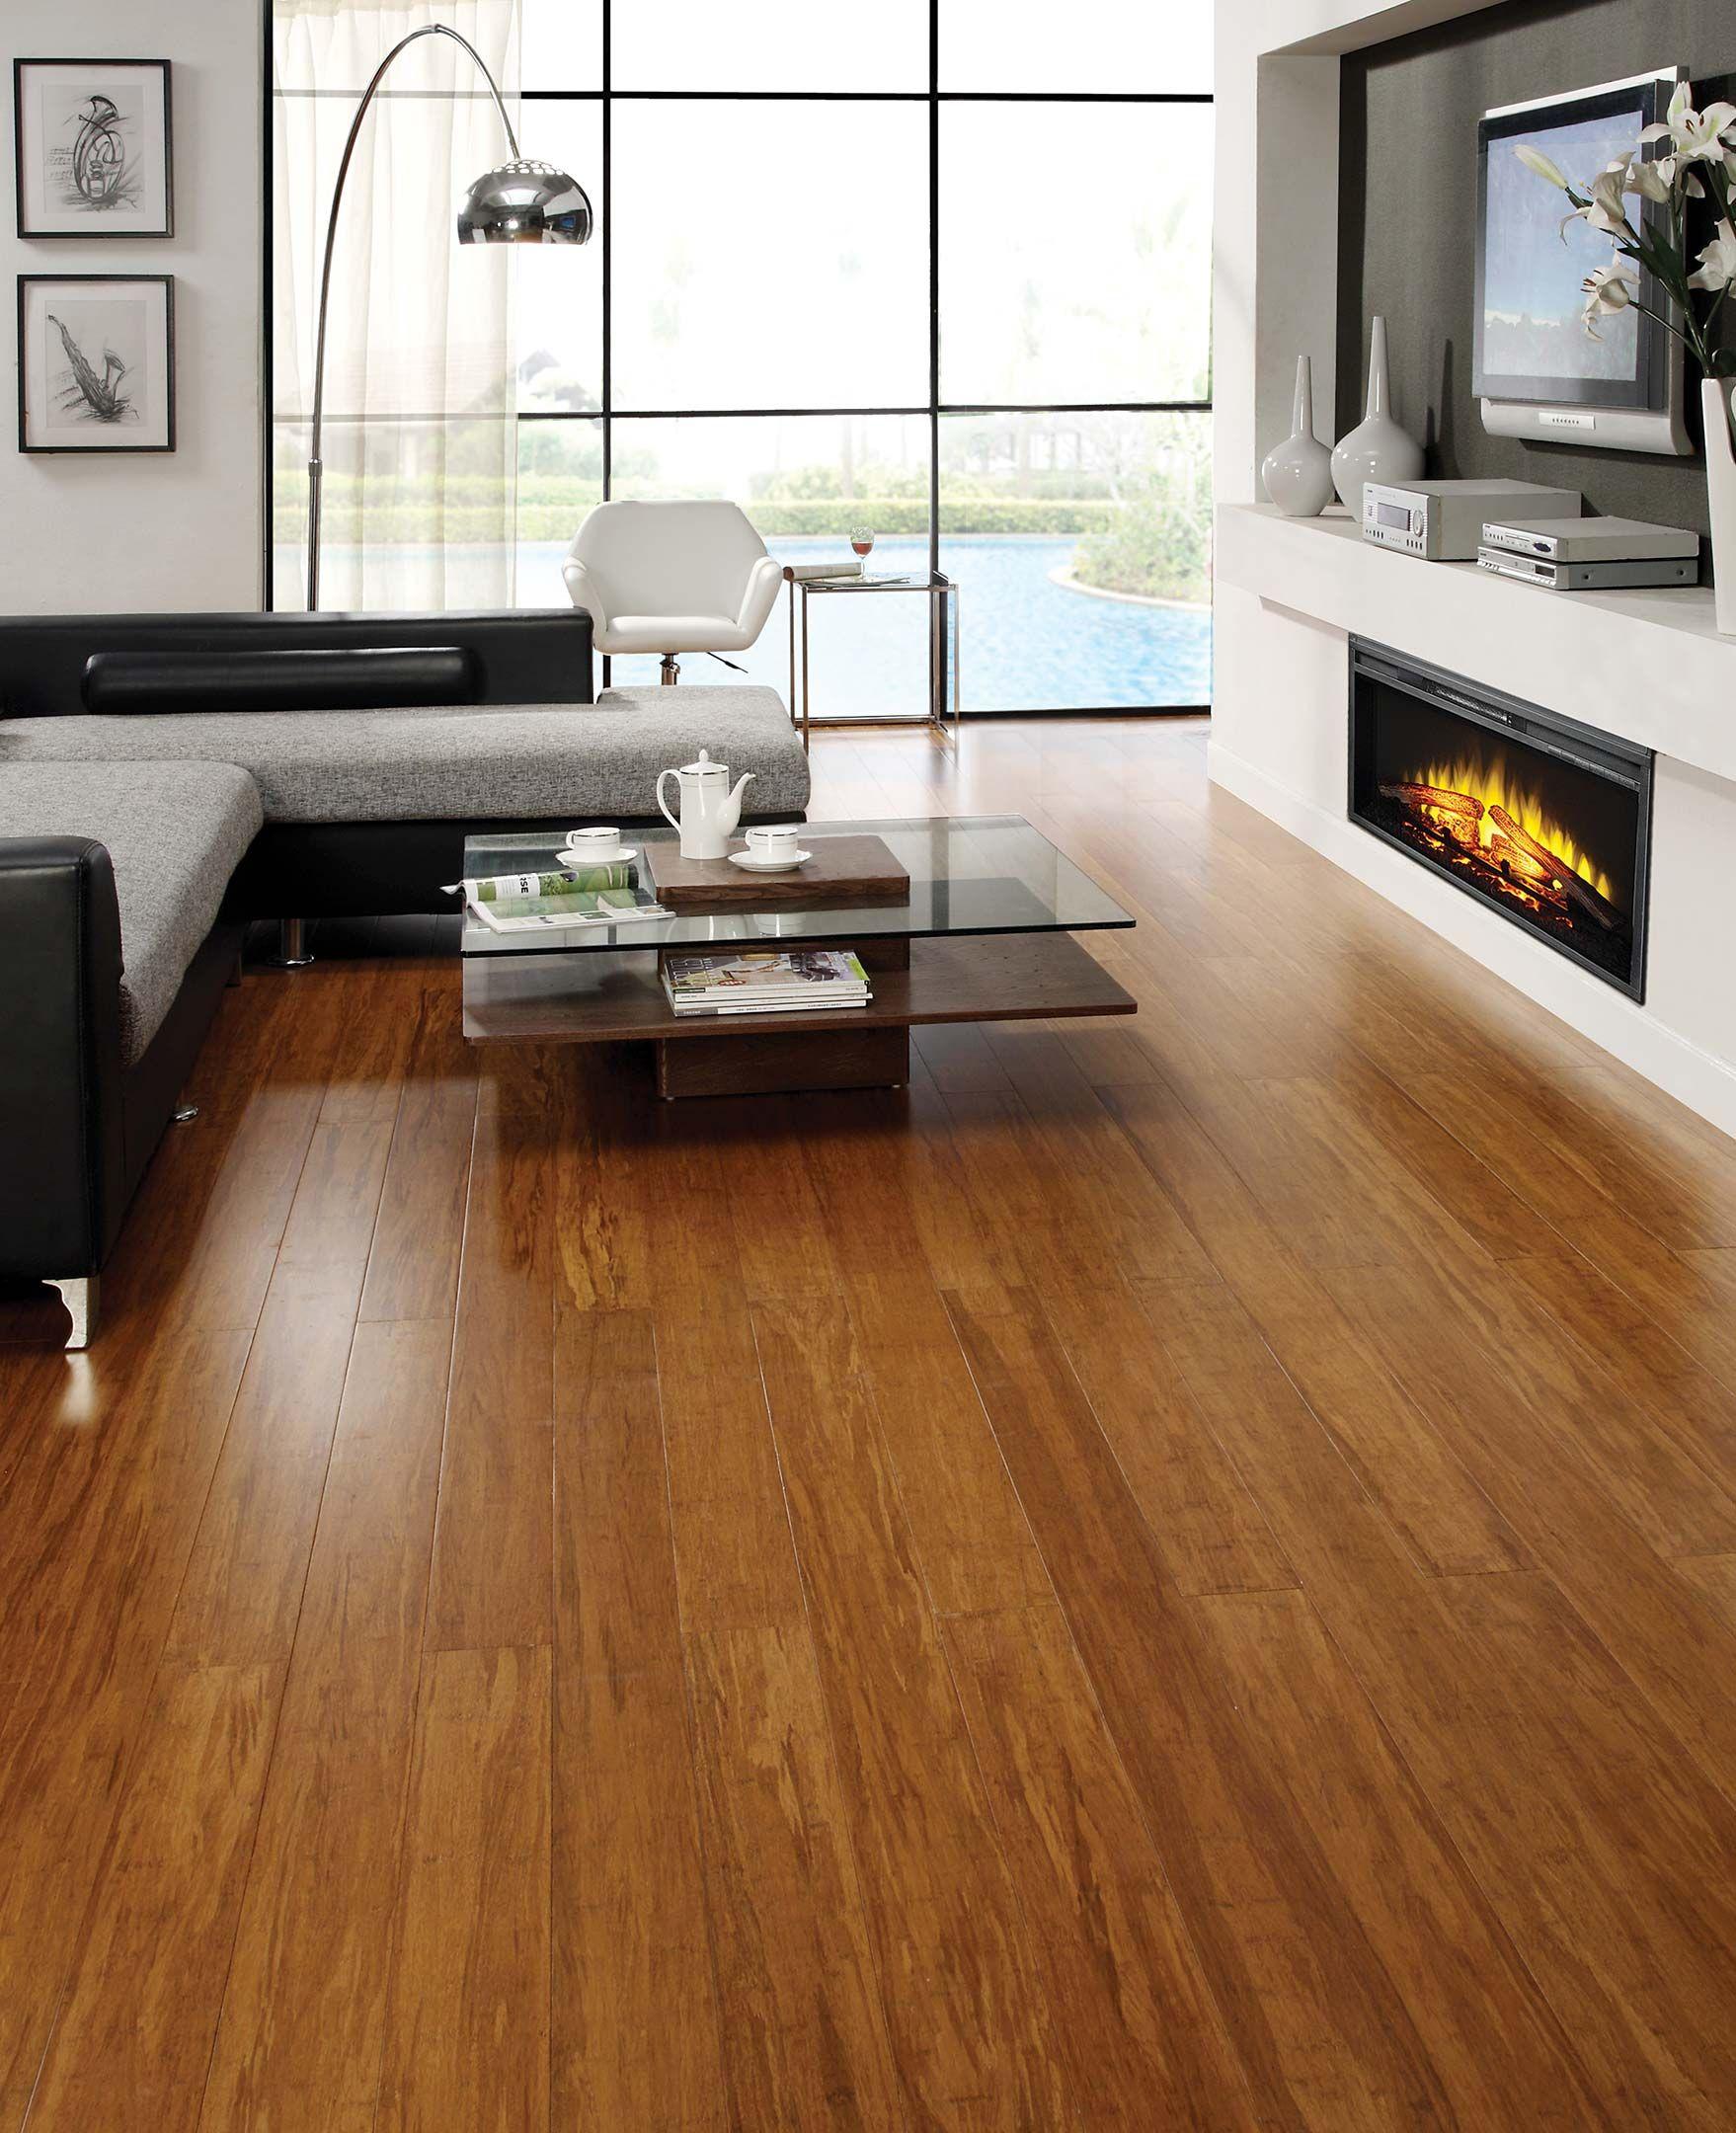 Vinyl flooring that looks like bamboo looks great bamboo flooring